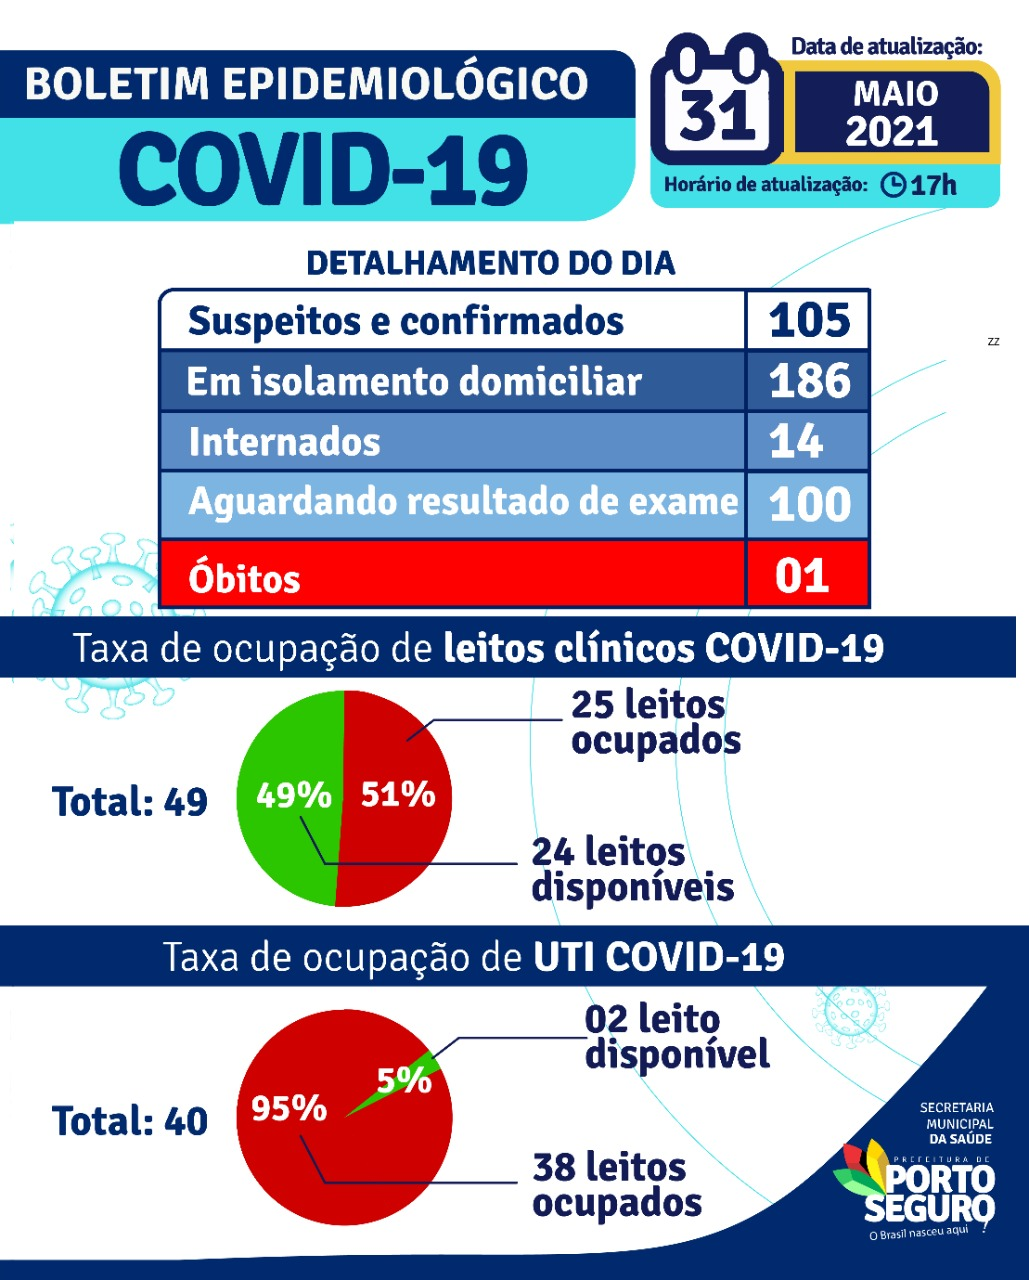 Porto Seguro: Boletim Epidemiológico Covid-19 (31/Maio) 22